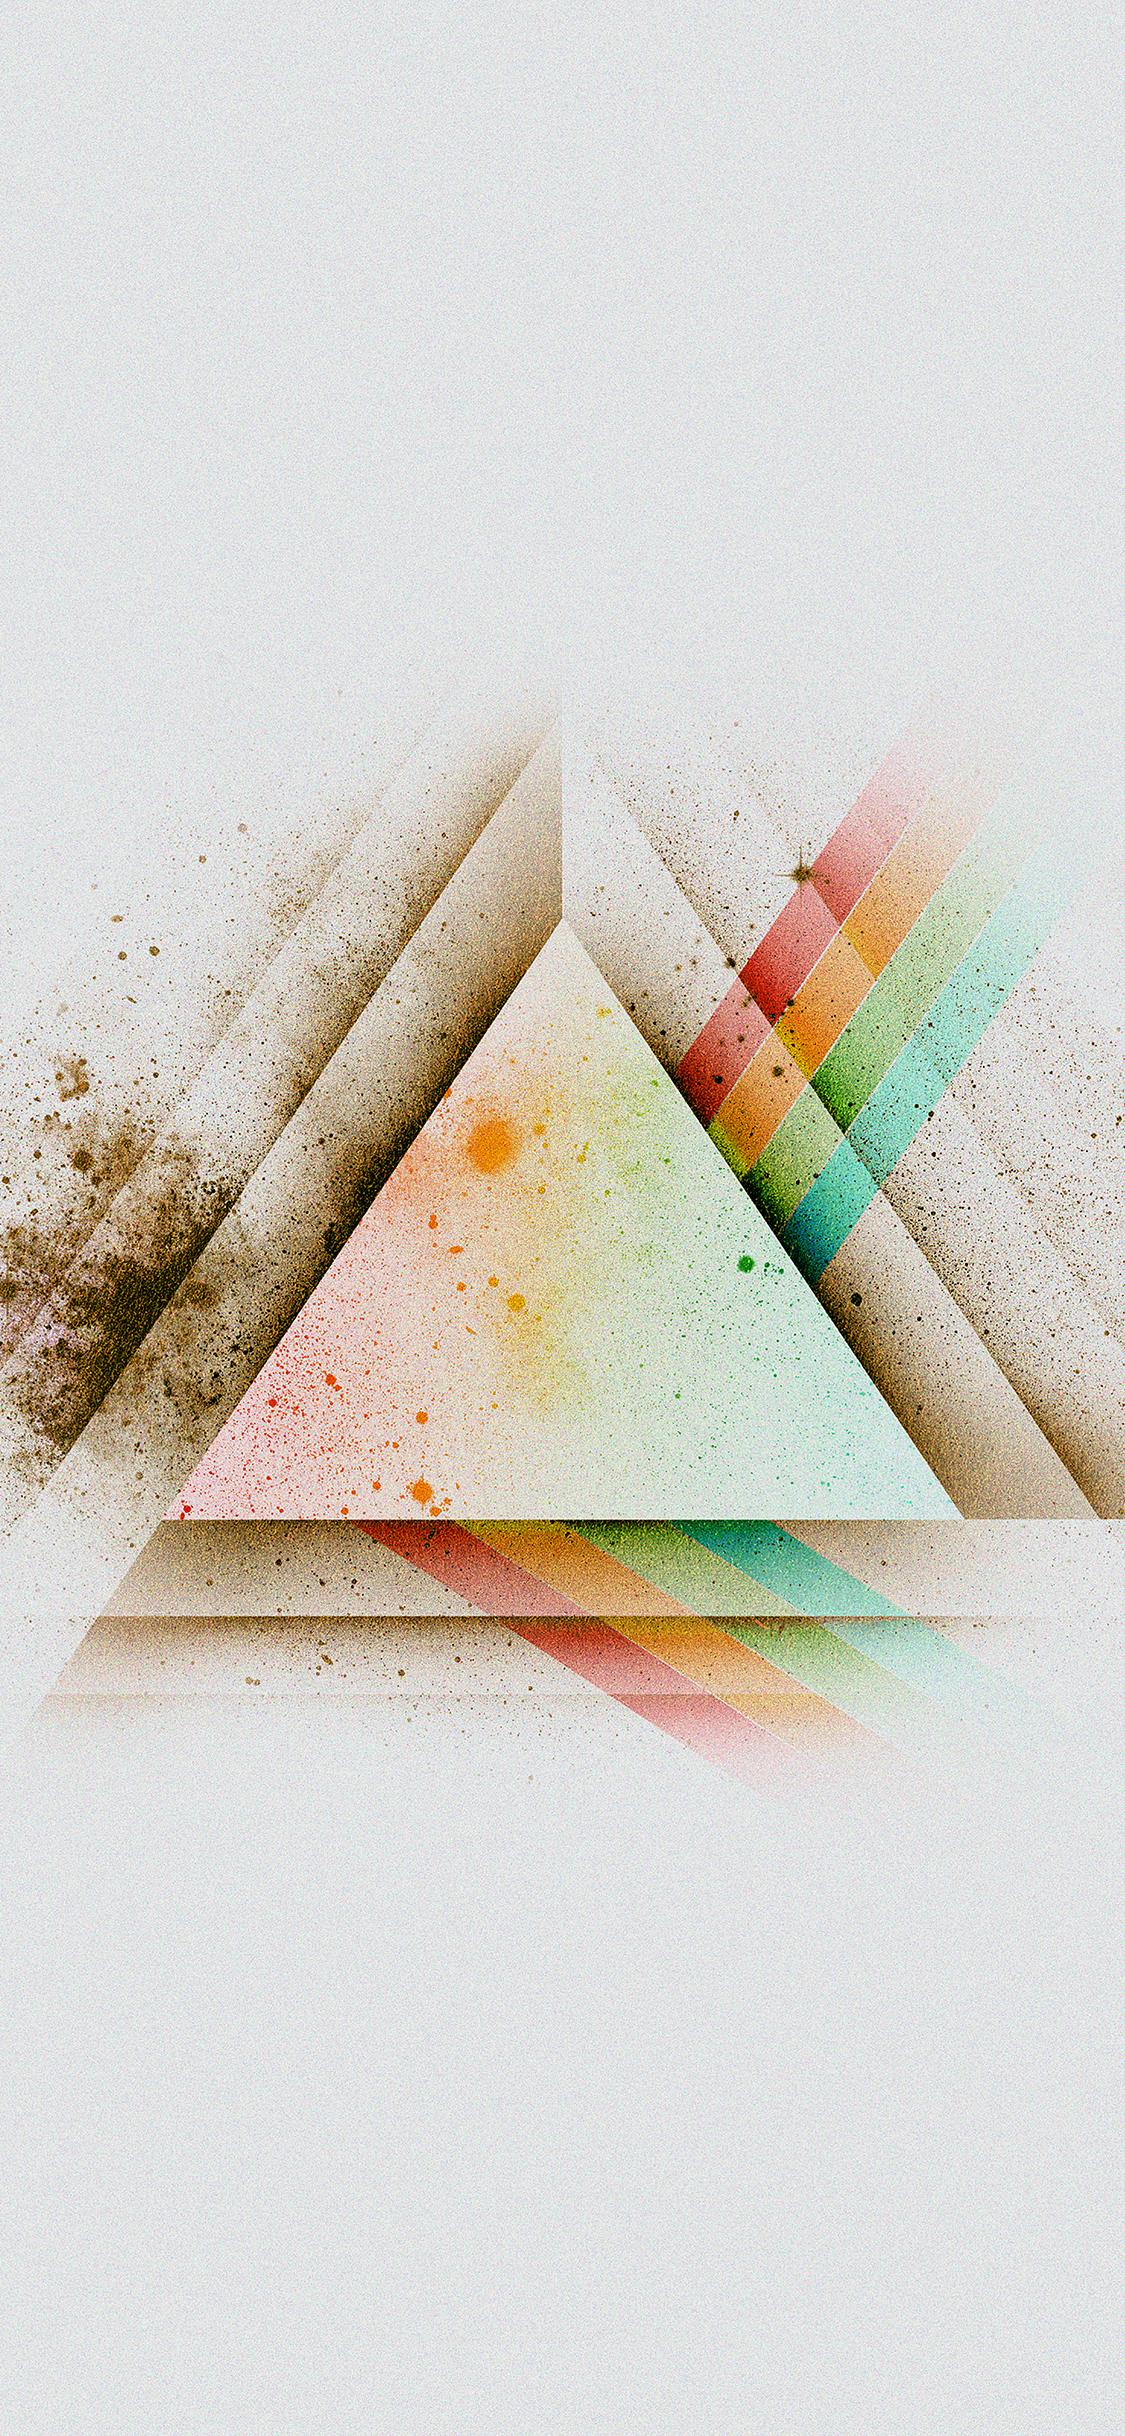 iPhoneXpapers.com-Apple-iPhone-wallpaper-ac09-wallpaper-triangle-art-white-rainbow-illust-graphic